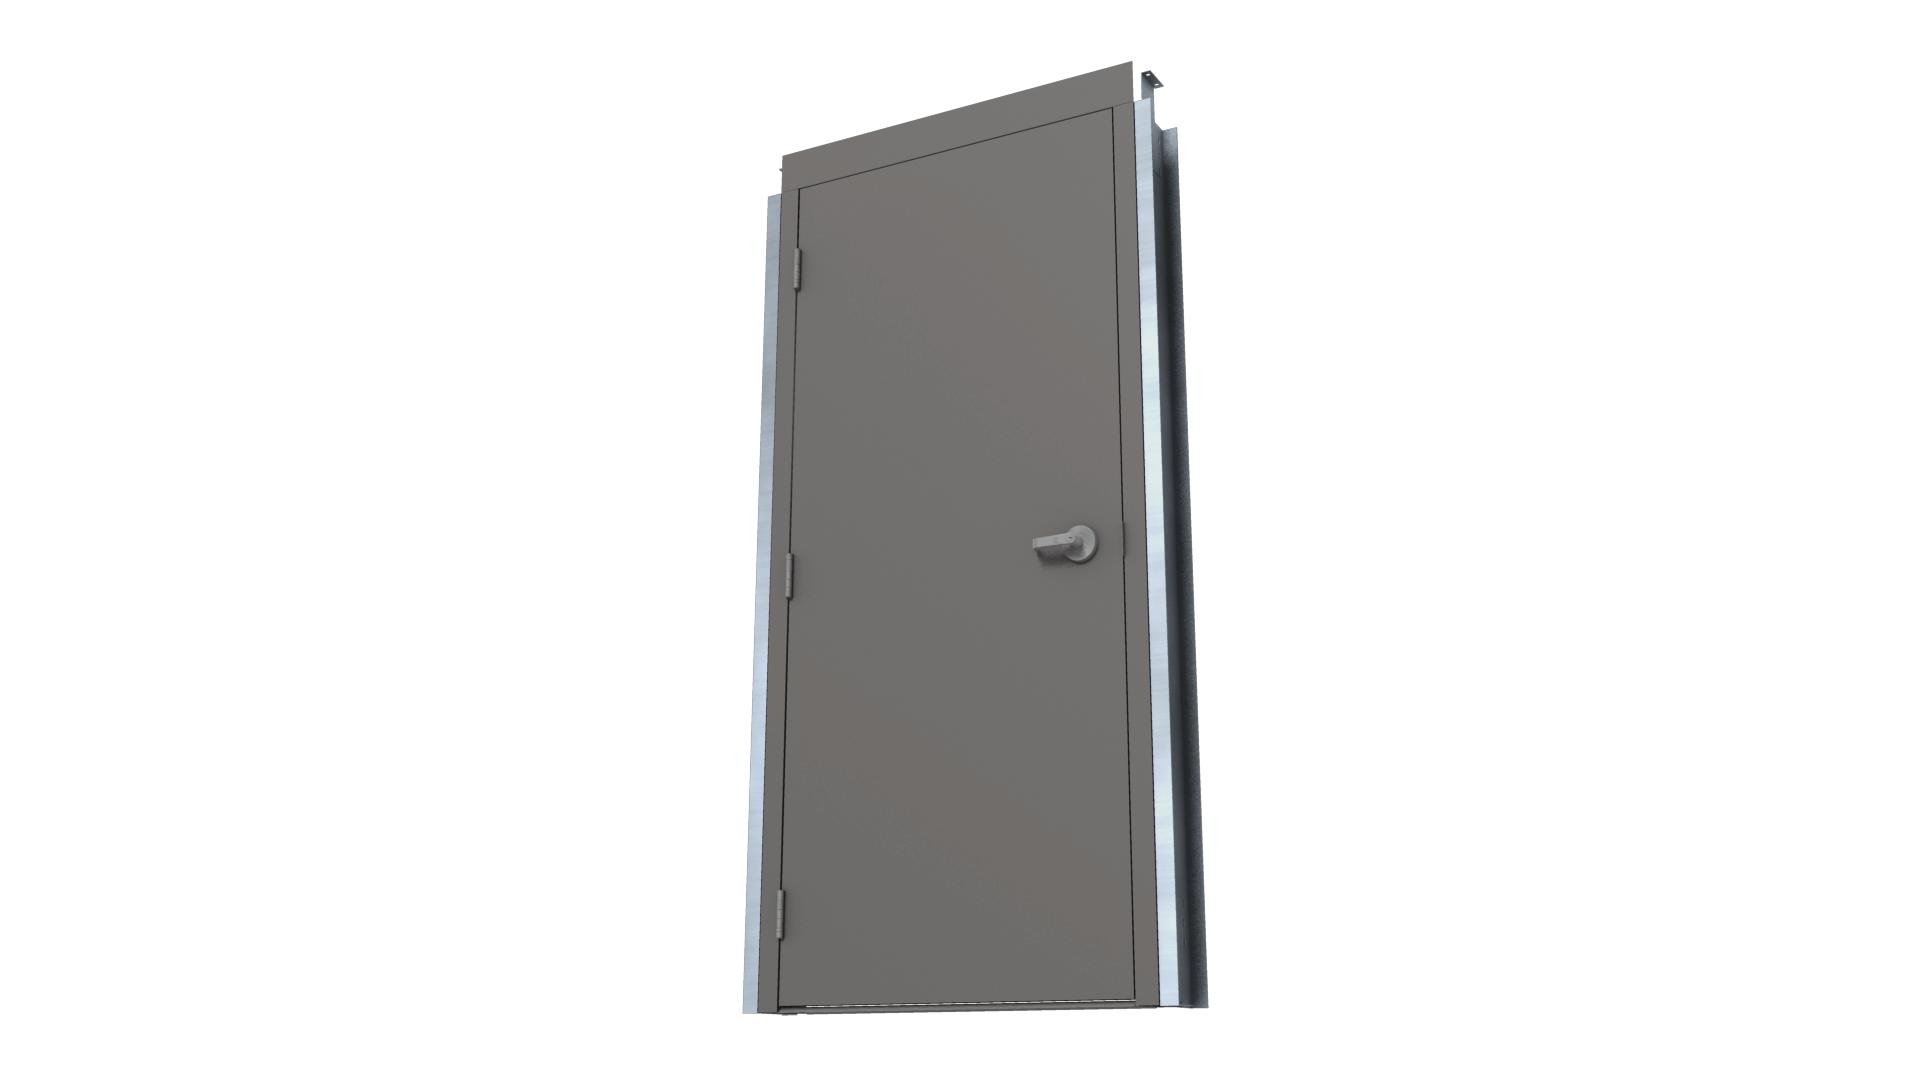 1080 #596672 Building Doors picture/photo Commercial Building Entry Doors 45391920